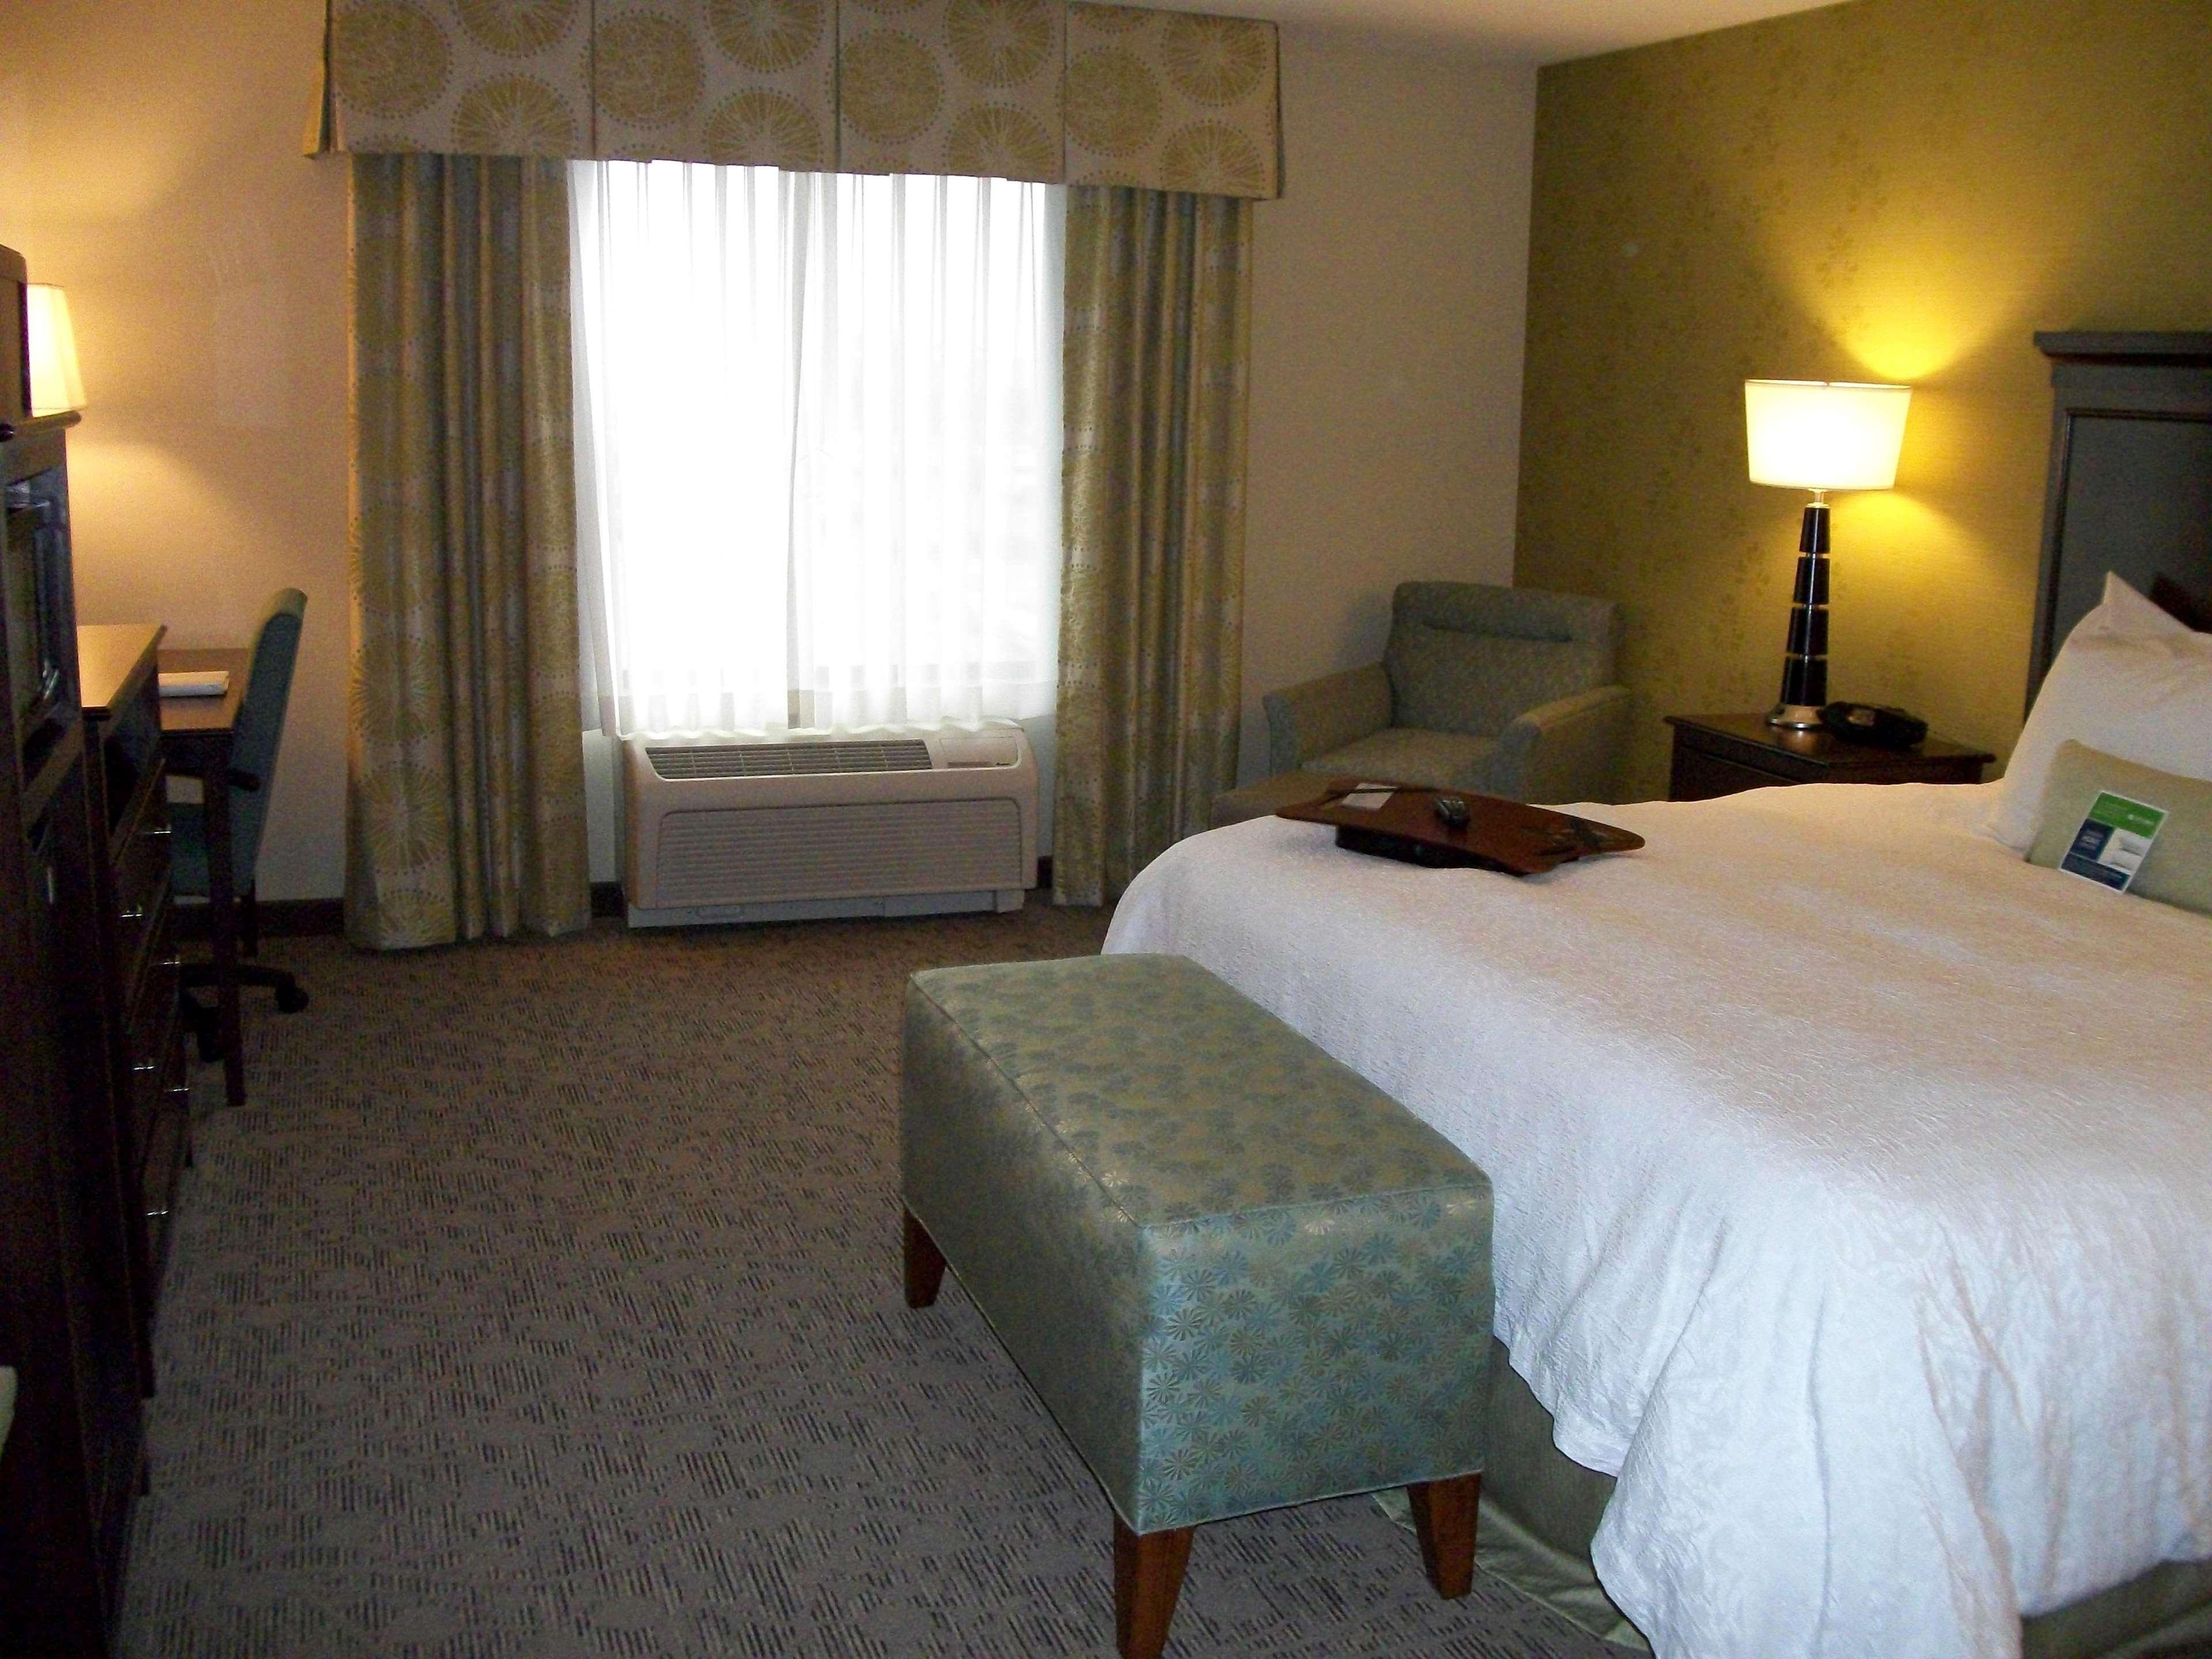 Hampton Inn & Suites Manteca image 46